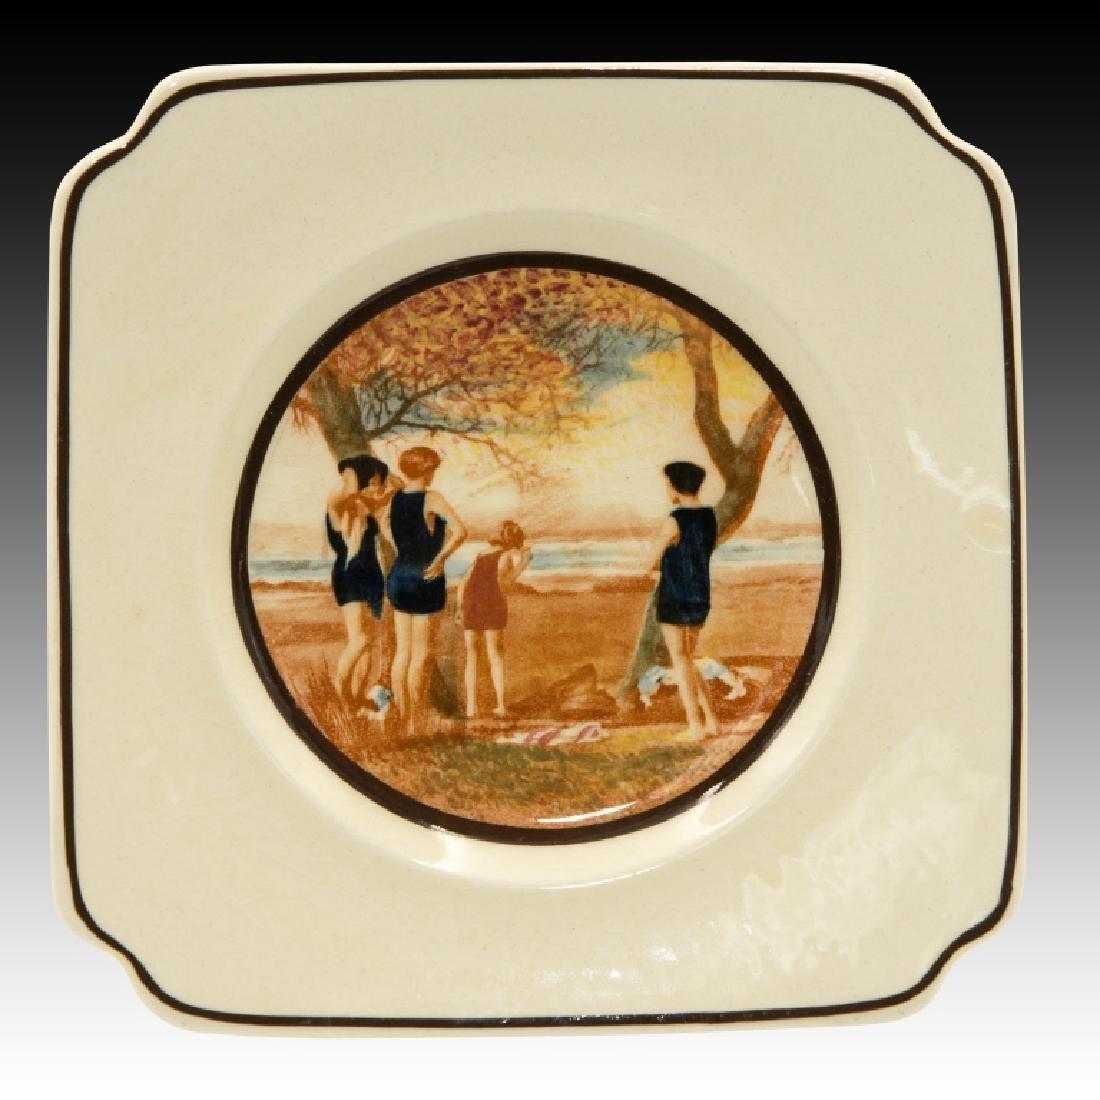 Royal Doulton Sandwich Set Surfing Design - 9